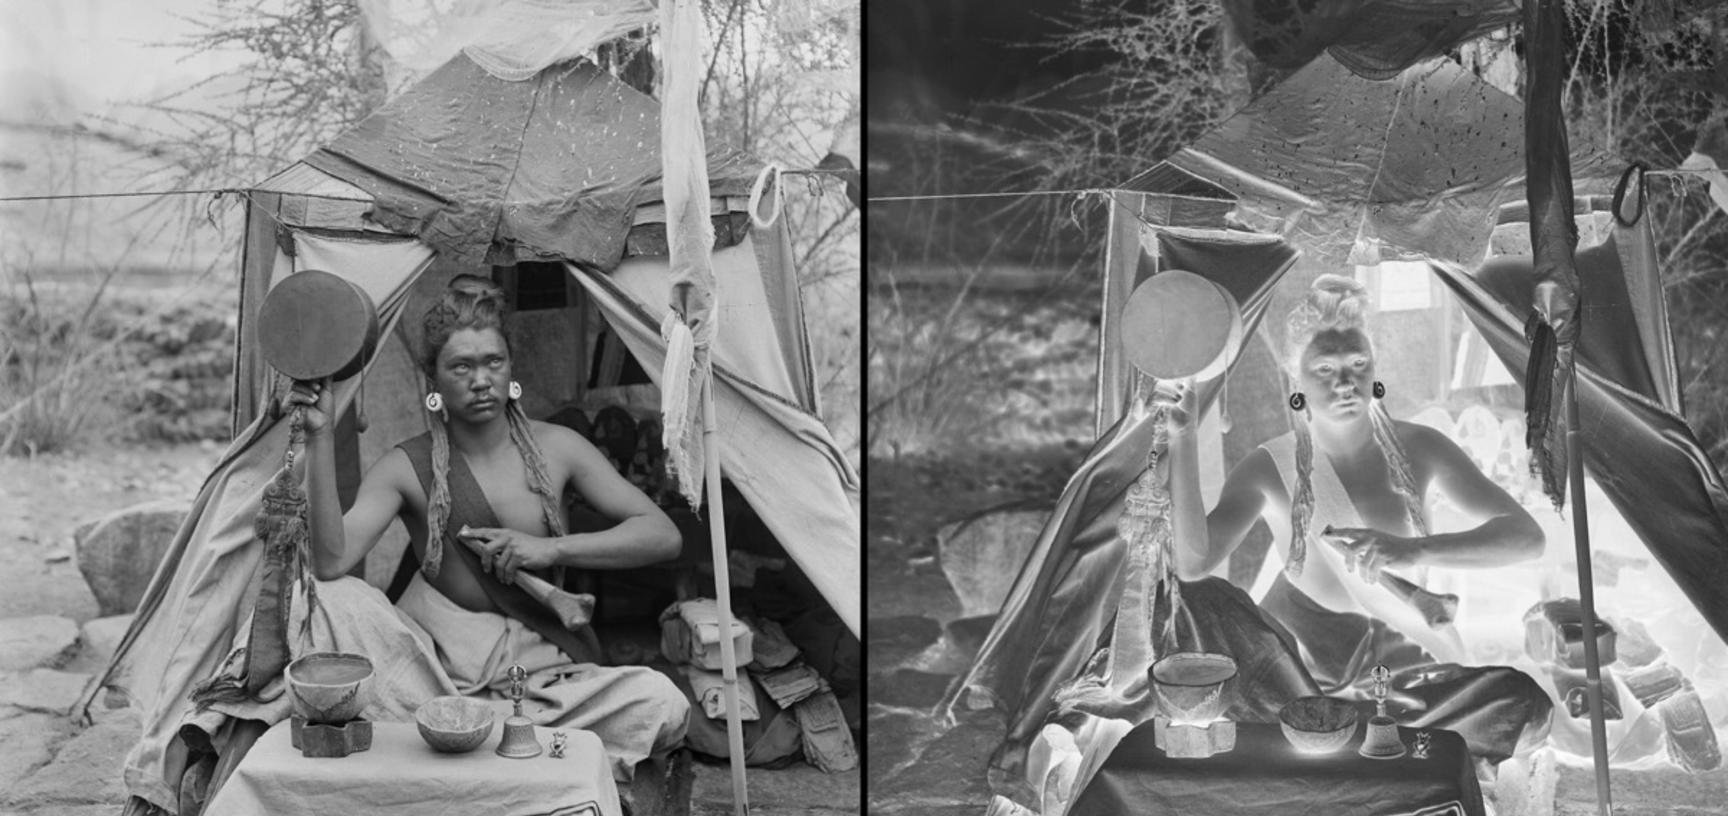 Truptop lama. Photograph by Rabden Lepcha. 1921.